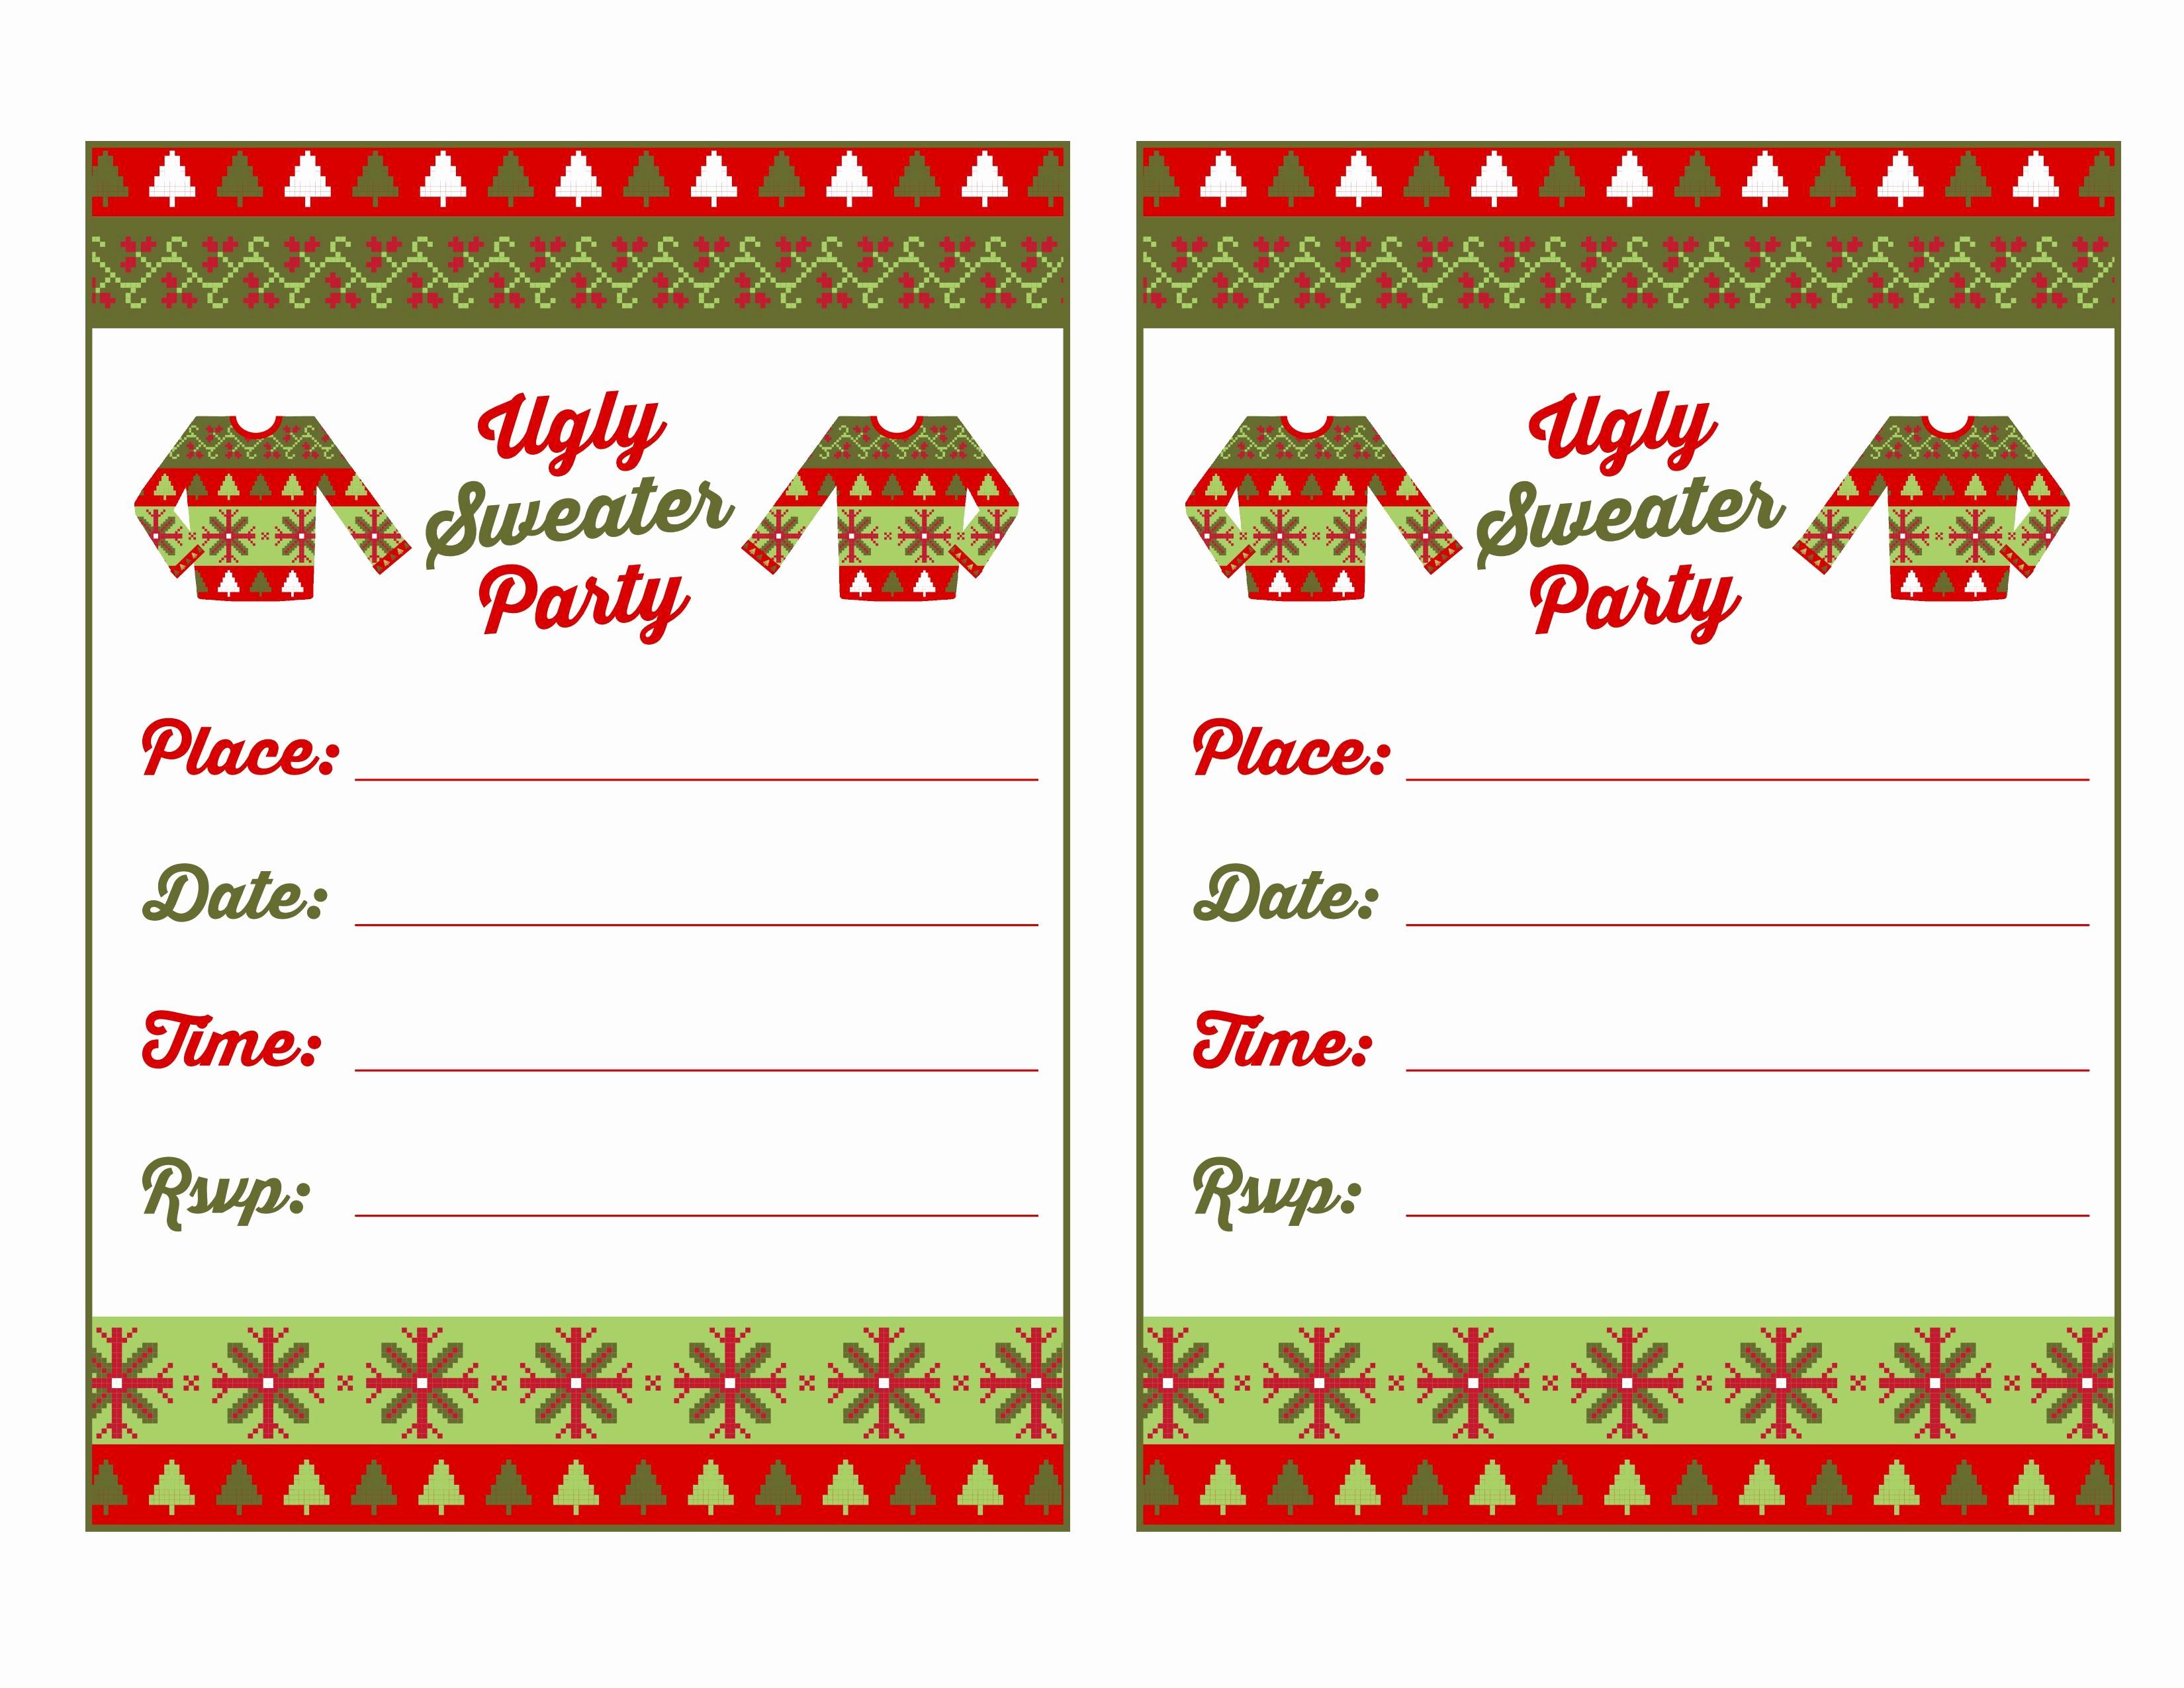 Free Printable Christmas Invitations Cards Elegant Baptism Invitation Ugly Sweater Invitation Template Free